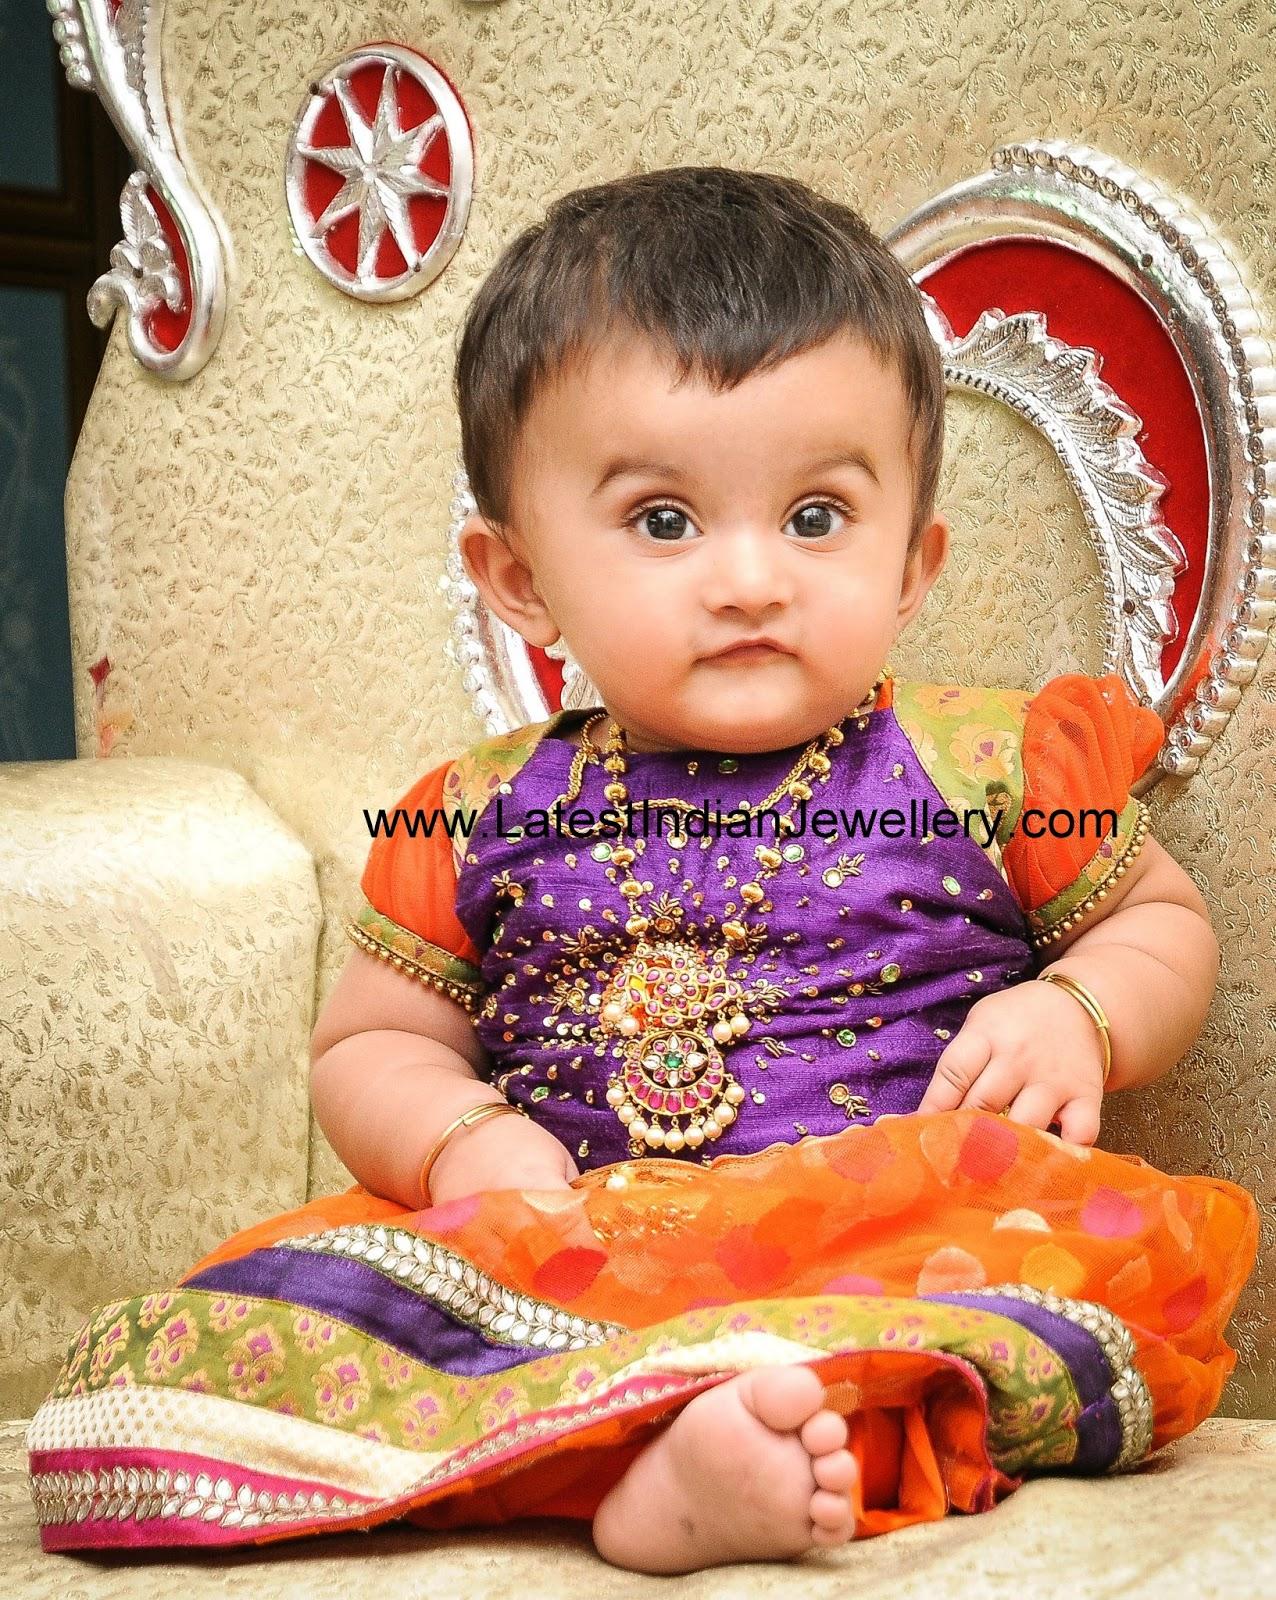 Cute Gold Baby Jewellery